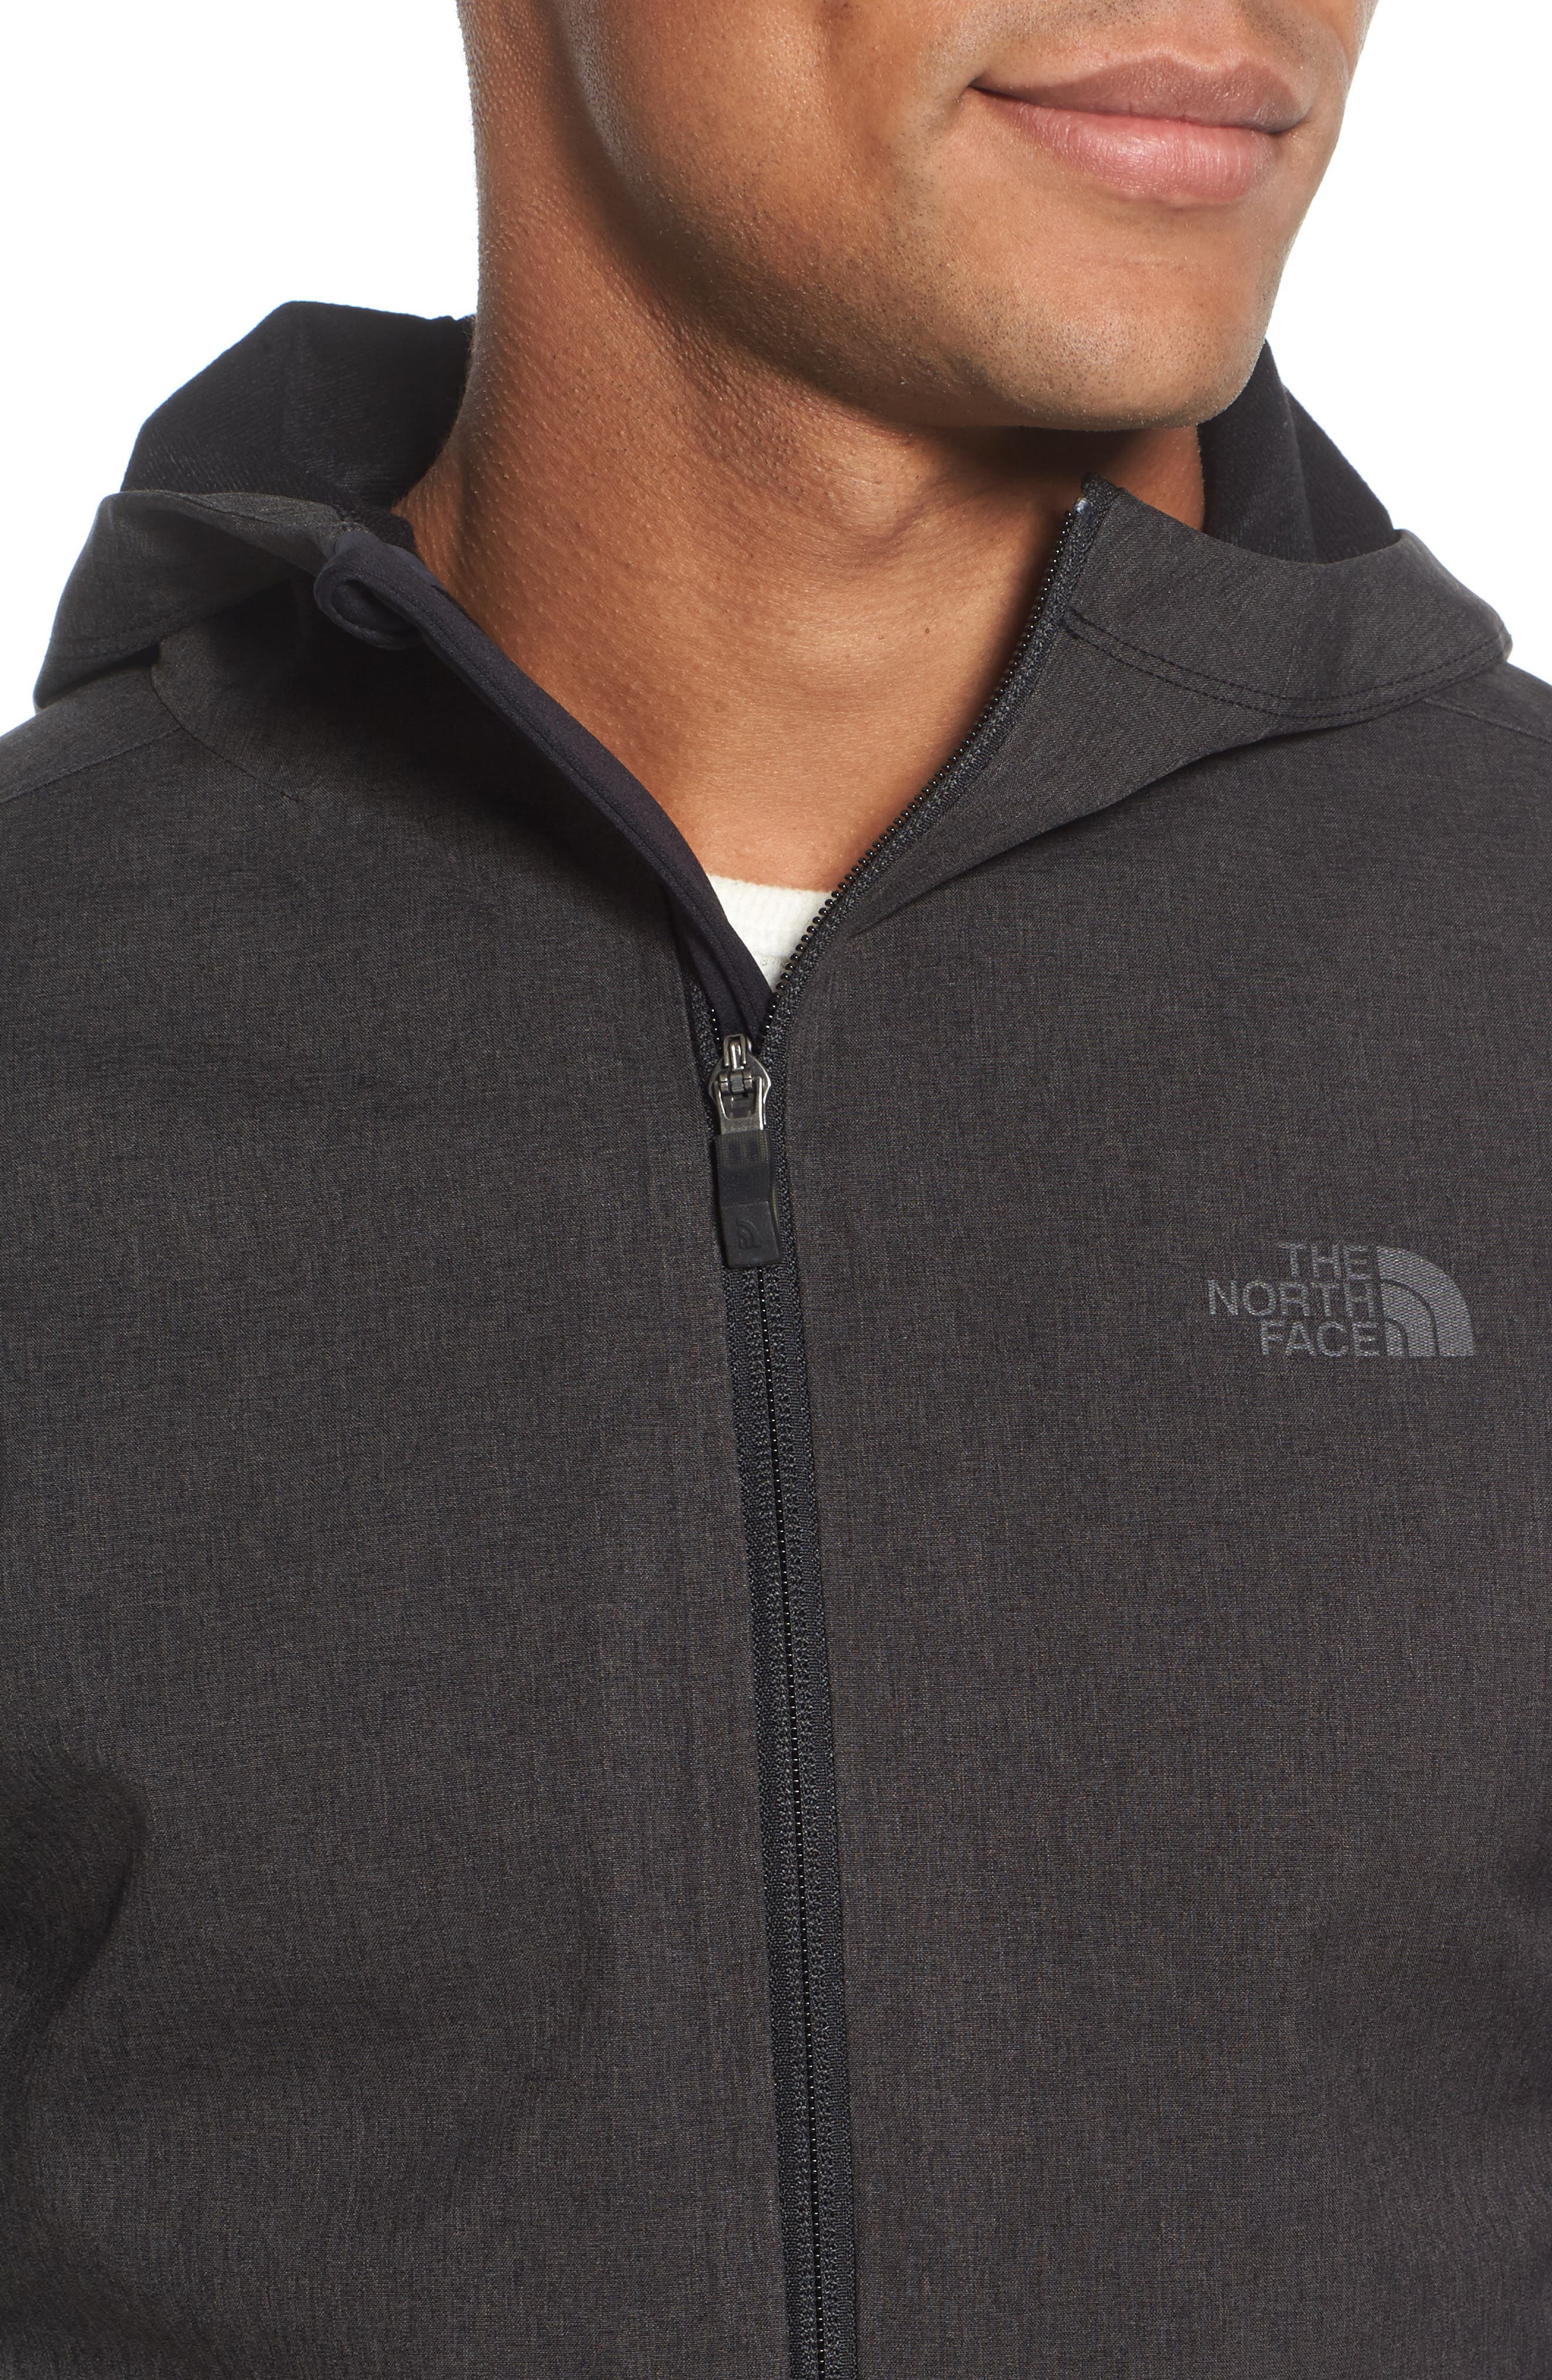 'Kilowatt' Hooded Jacket,                             Alternate thumbnail 4, color,                             001